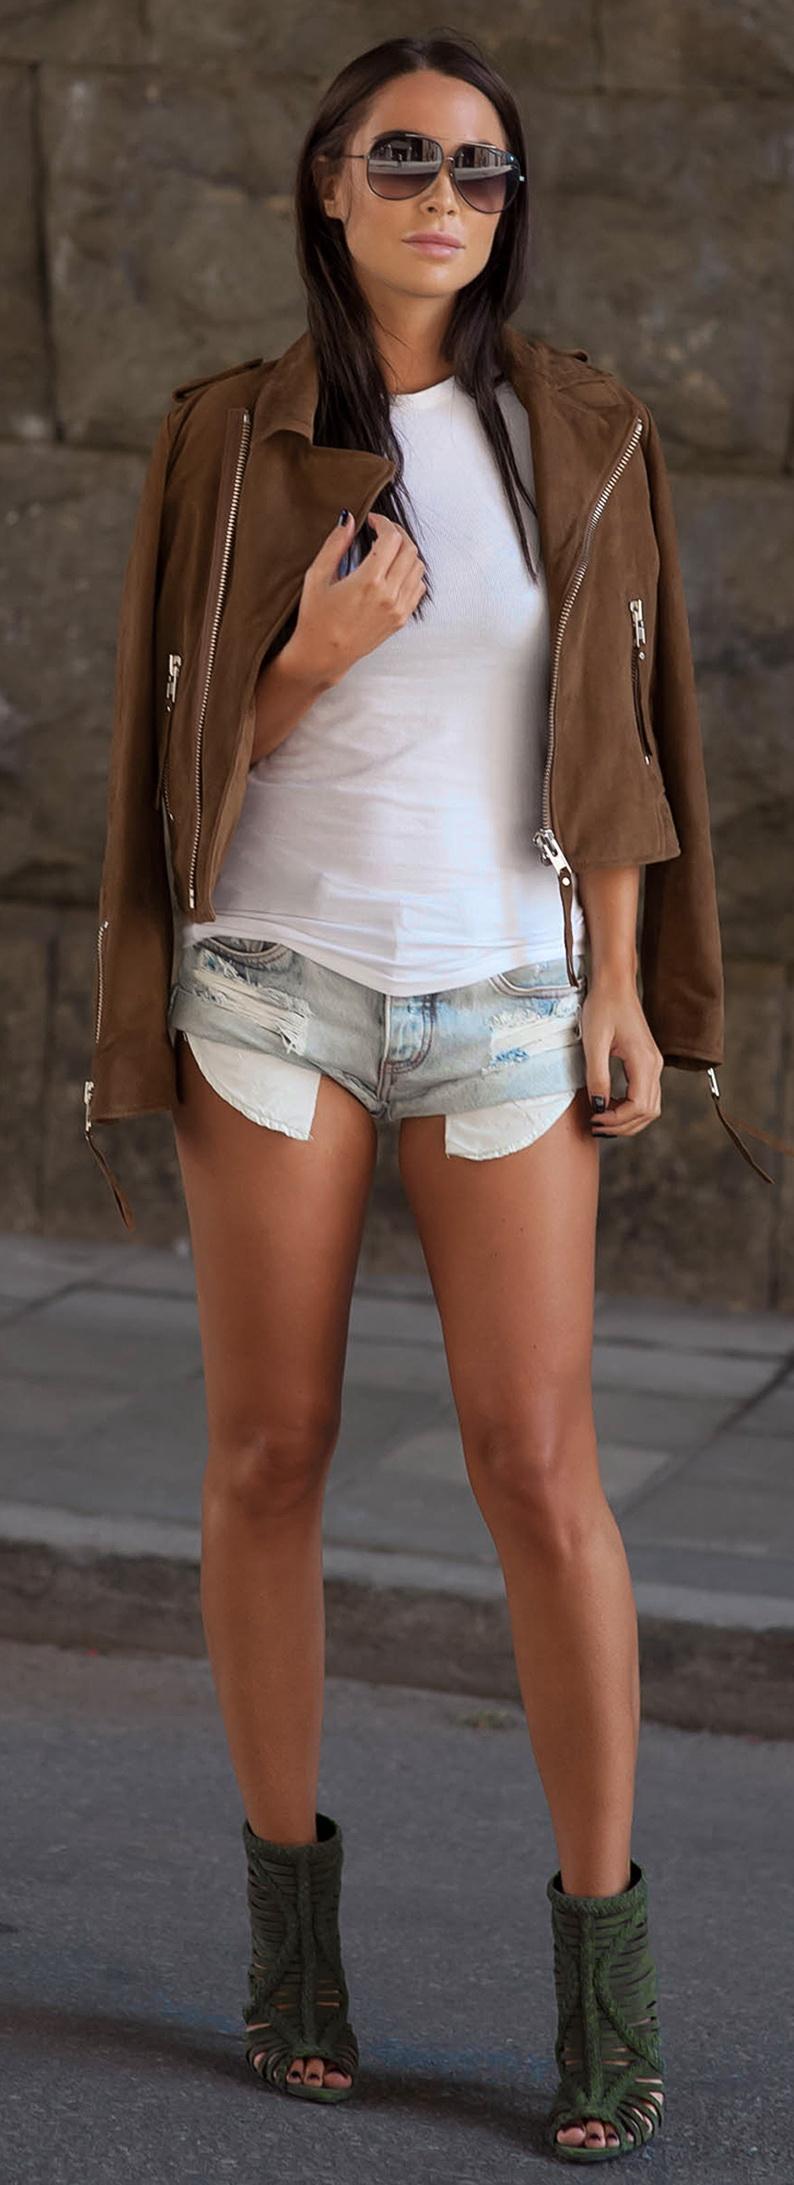 Shoes: SCHUTZ // Shorts: ONE TEASPOON // Sunglasses: DITA // Jacket: LXLS